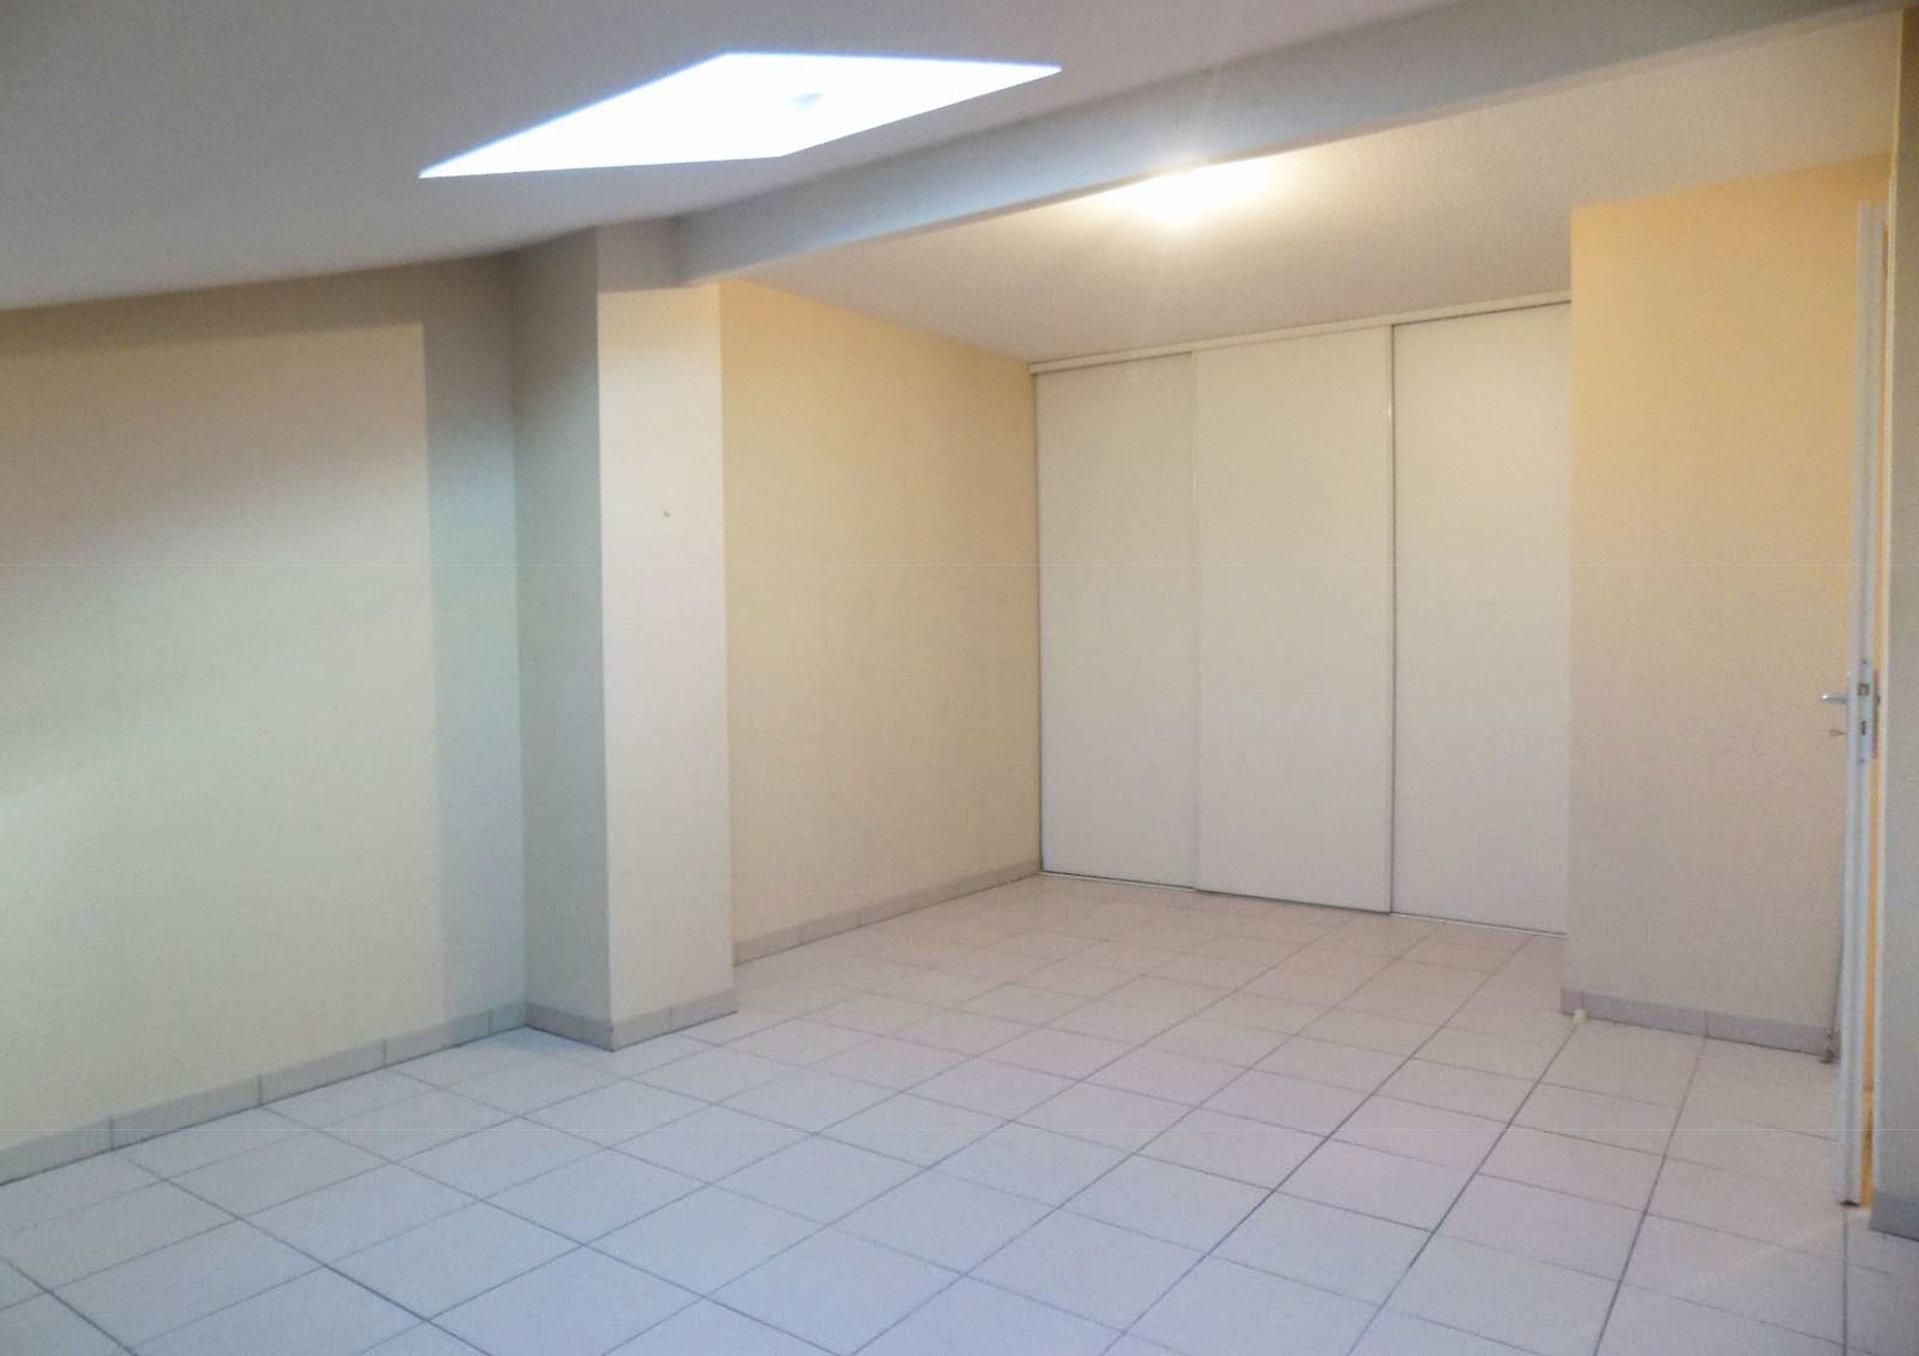 Appartement T2 Duplex - 51m² - 31140 AUCAMVILLE